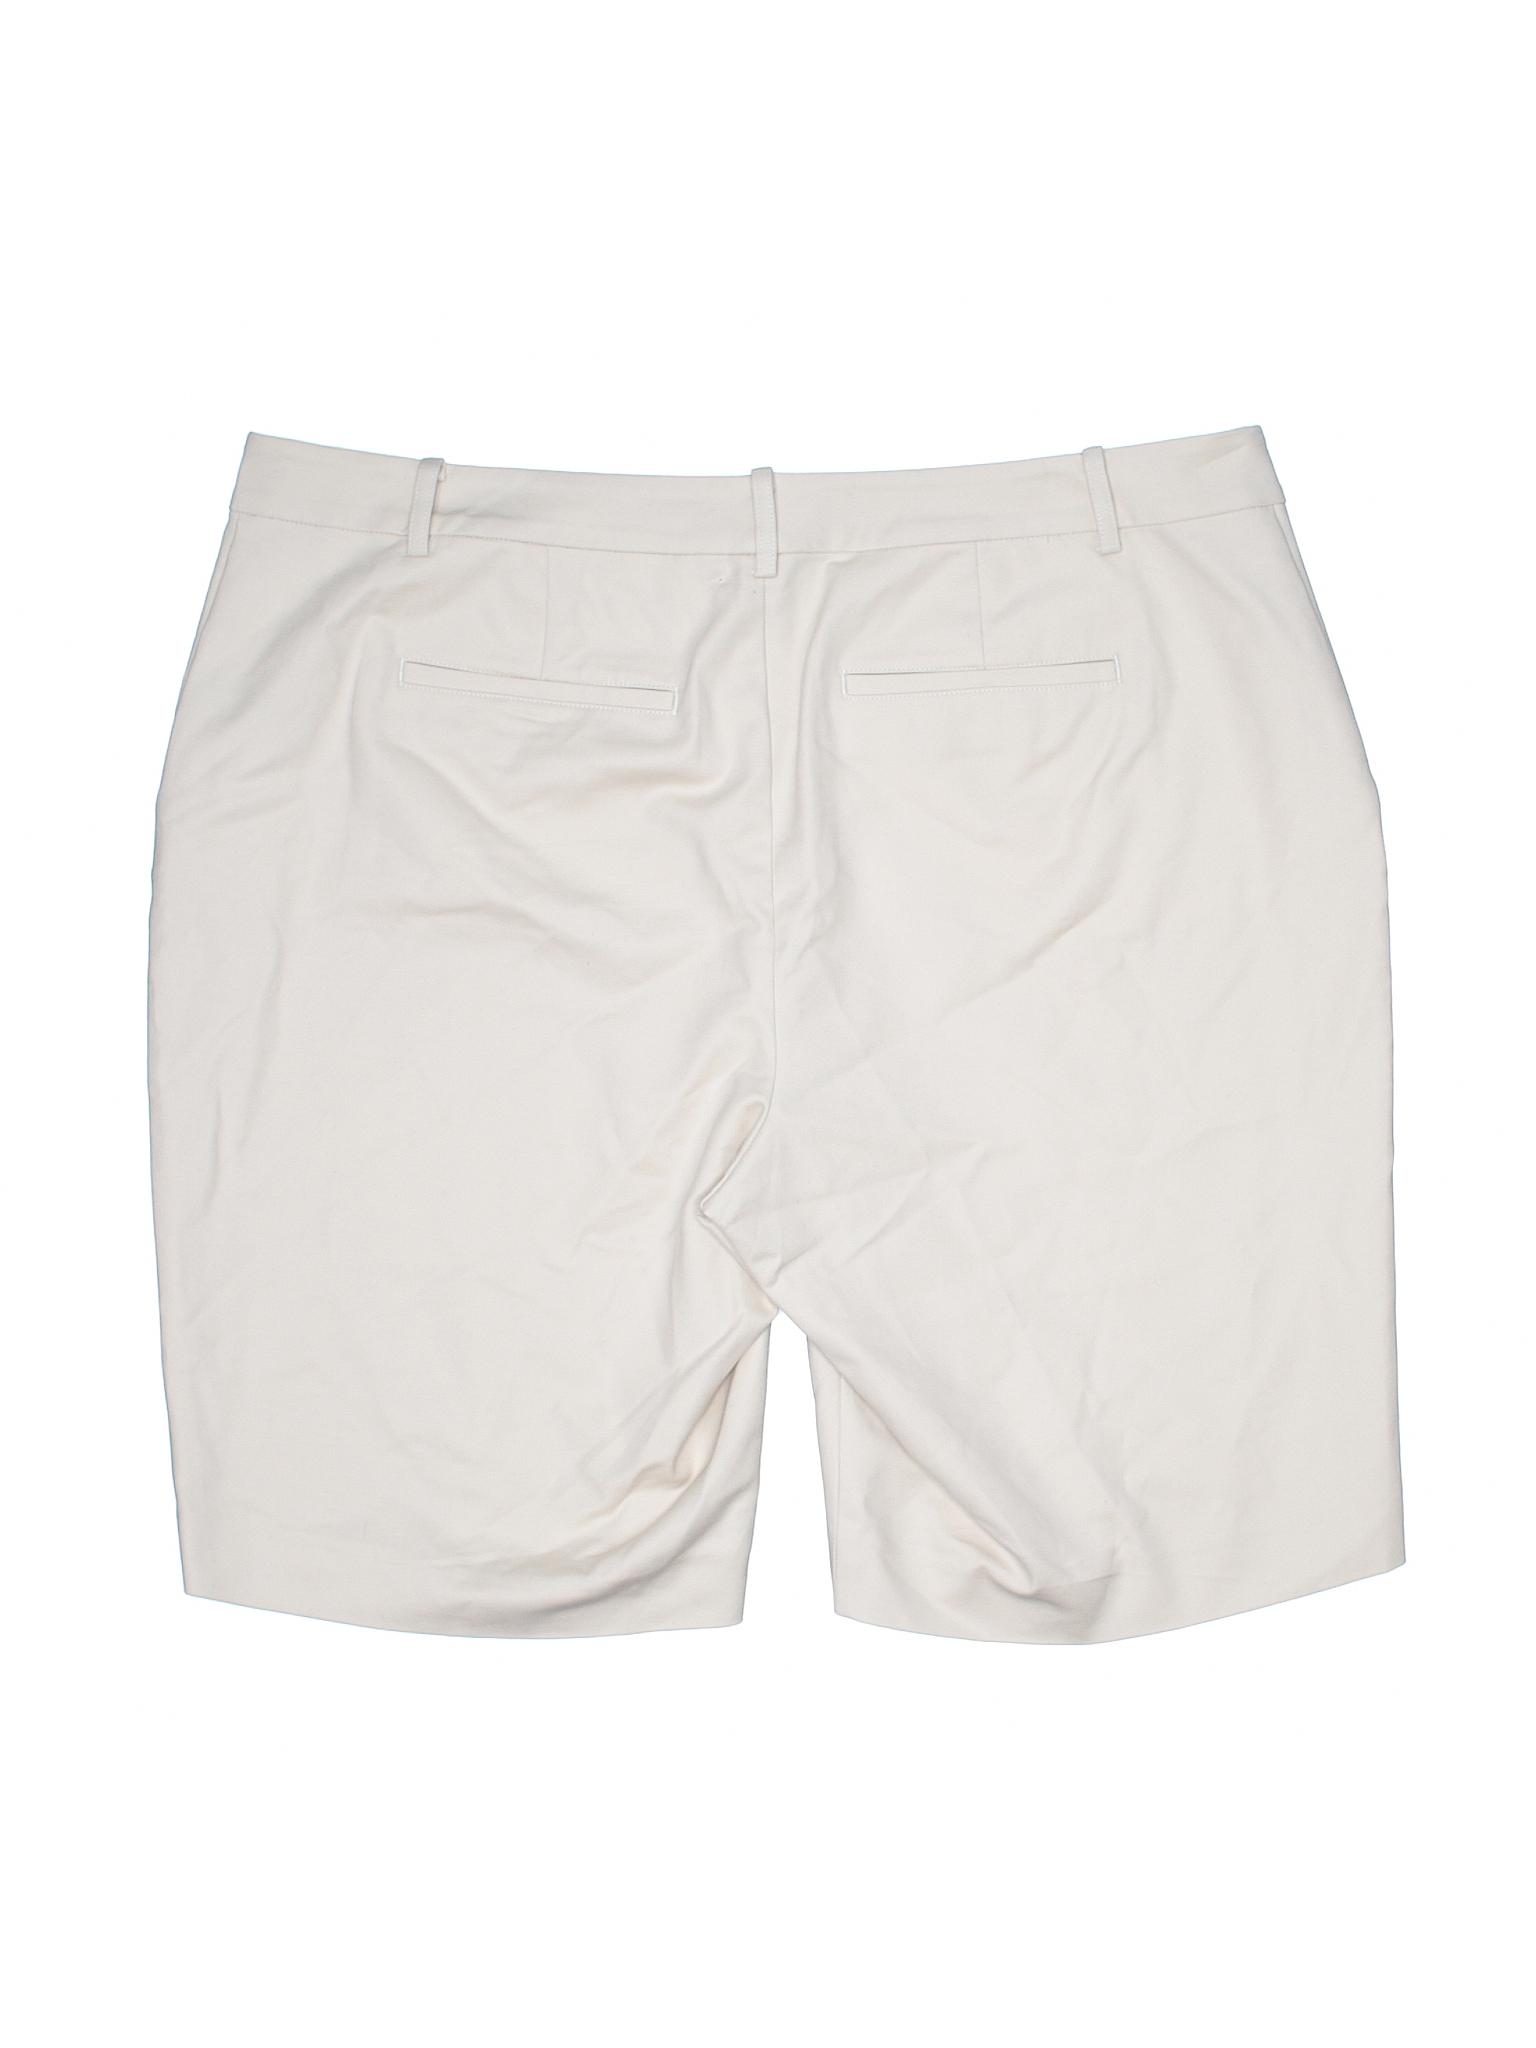 Shorts Dressy Lauren Lauren Boutique by Ralph fRZnUw